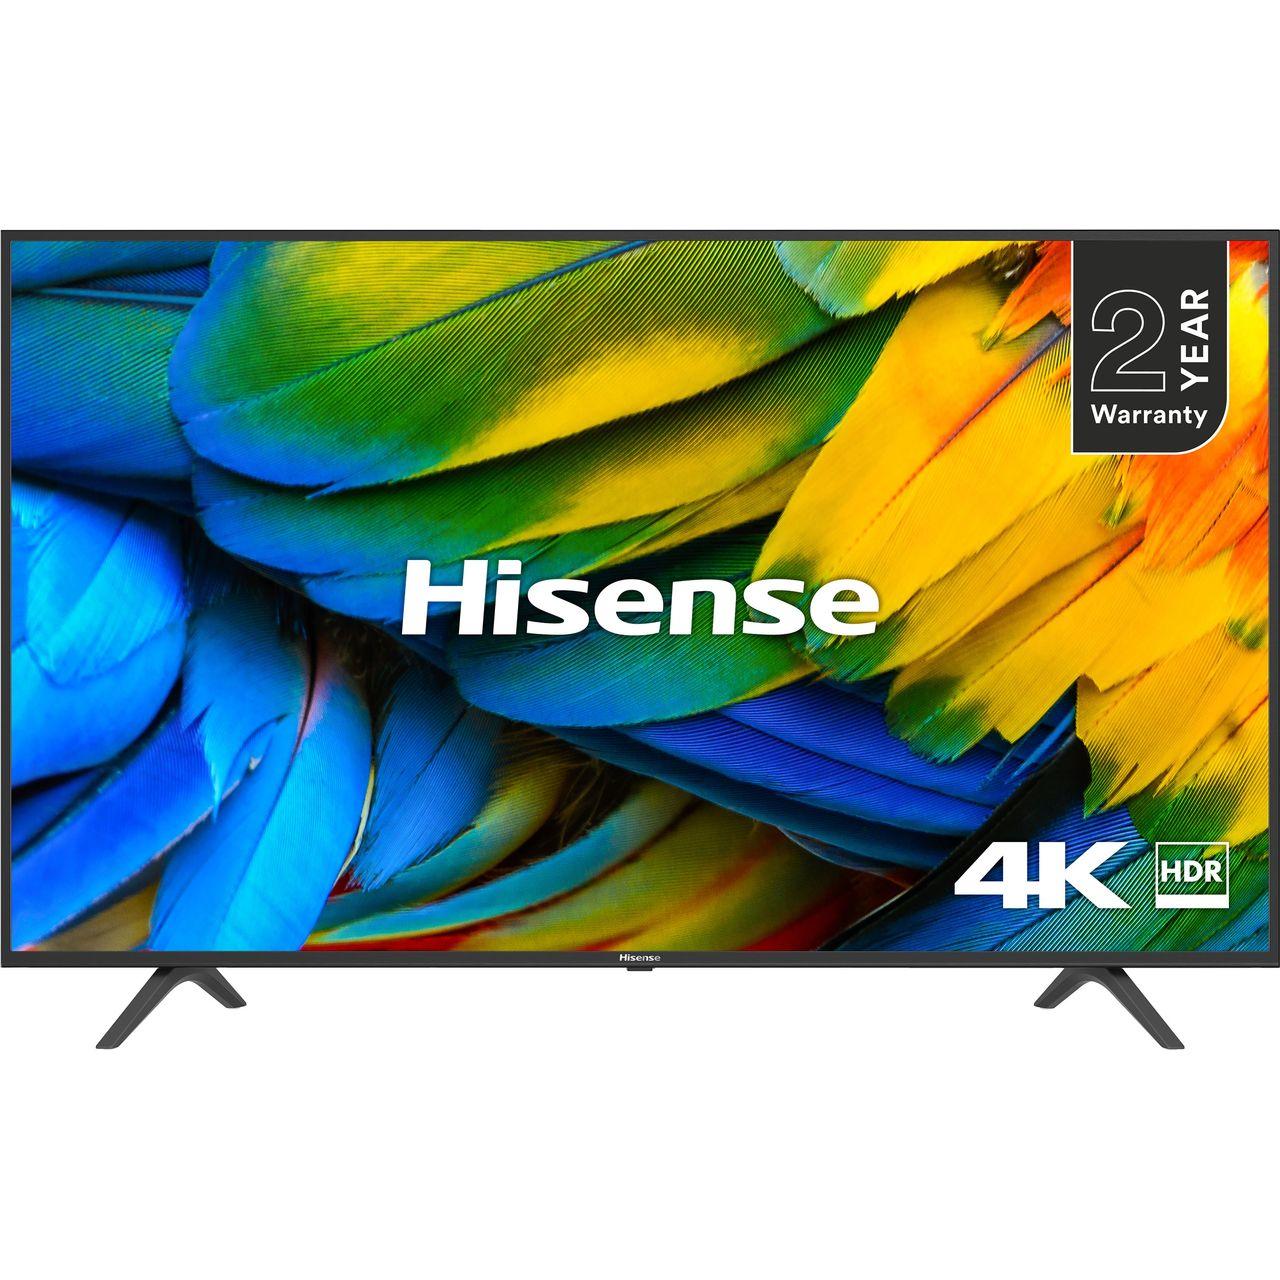 "Hisense H50B7100UK 50"" Smart 4K Ultra HD TV with HDR10 and DTS Studio Sound + PS4 Fifa 20 Bundle £389 @ AO"